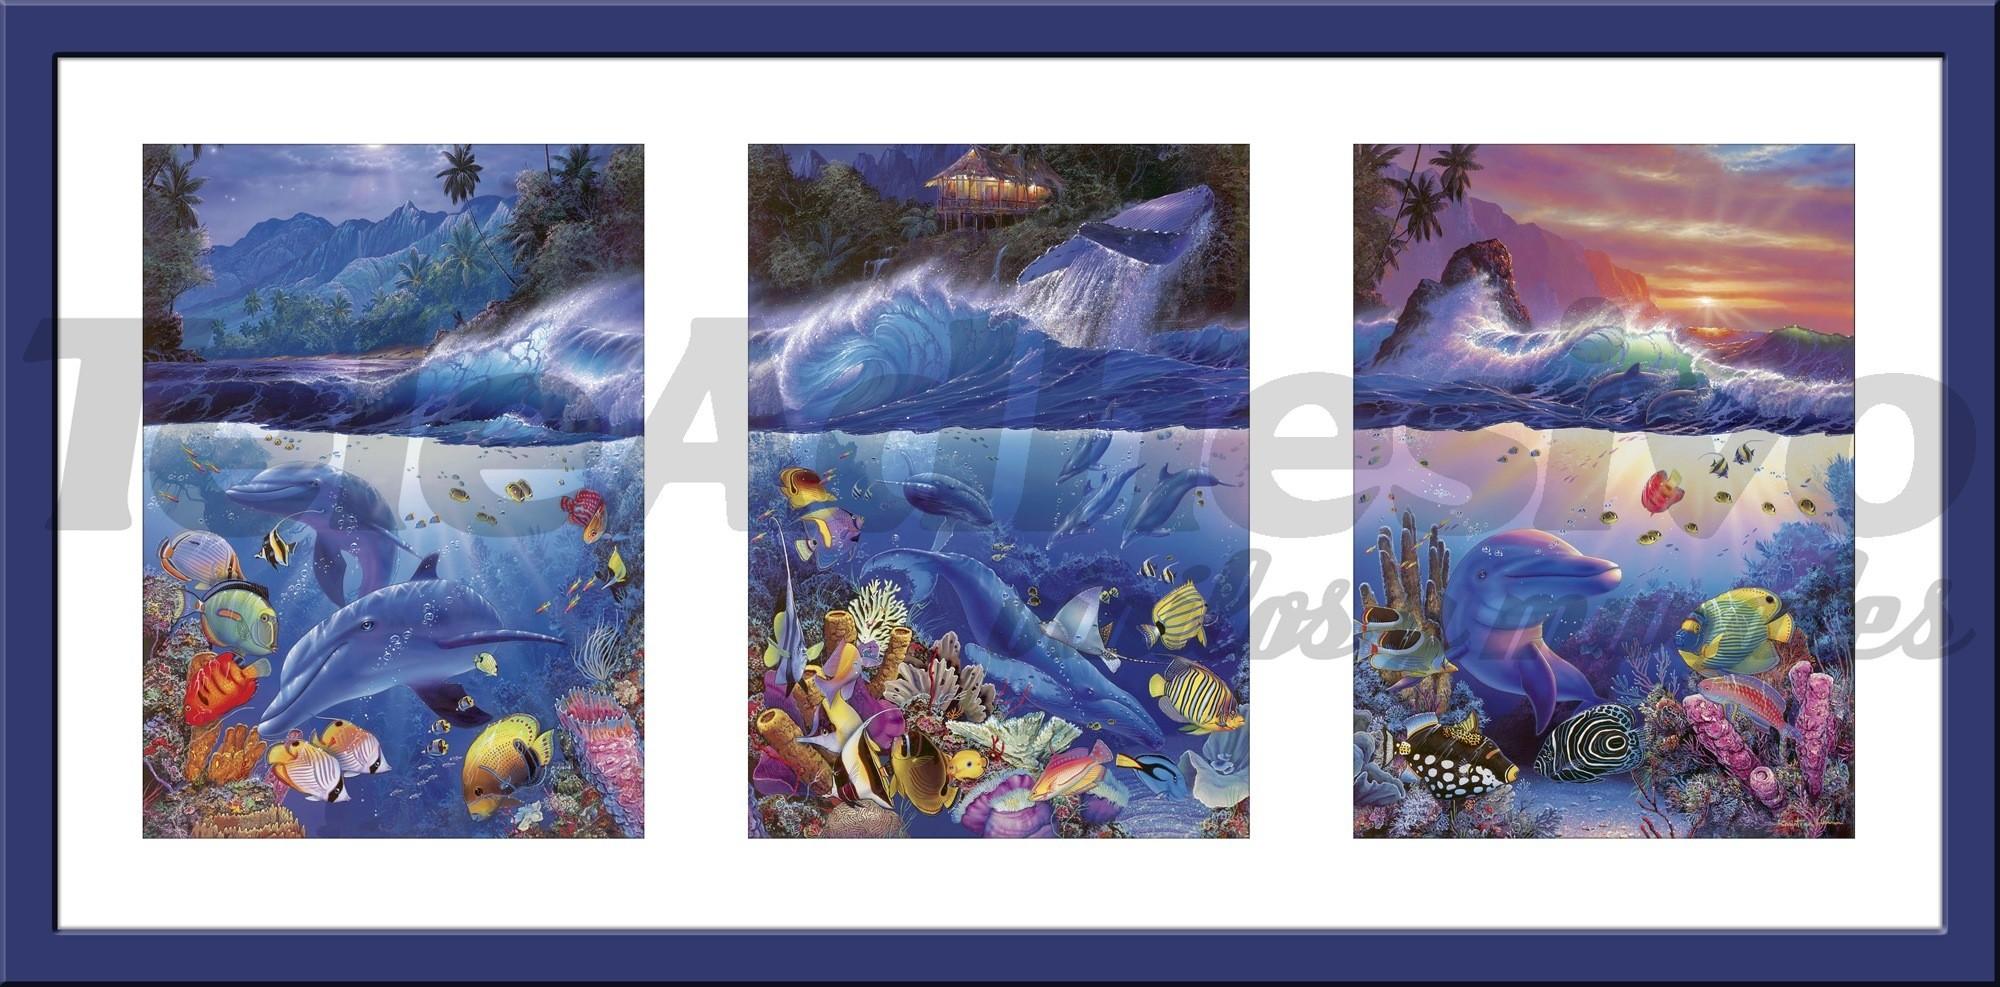 Wandtattoos Triptychon Meeresboden